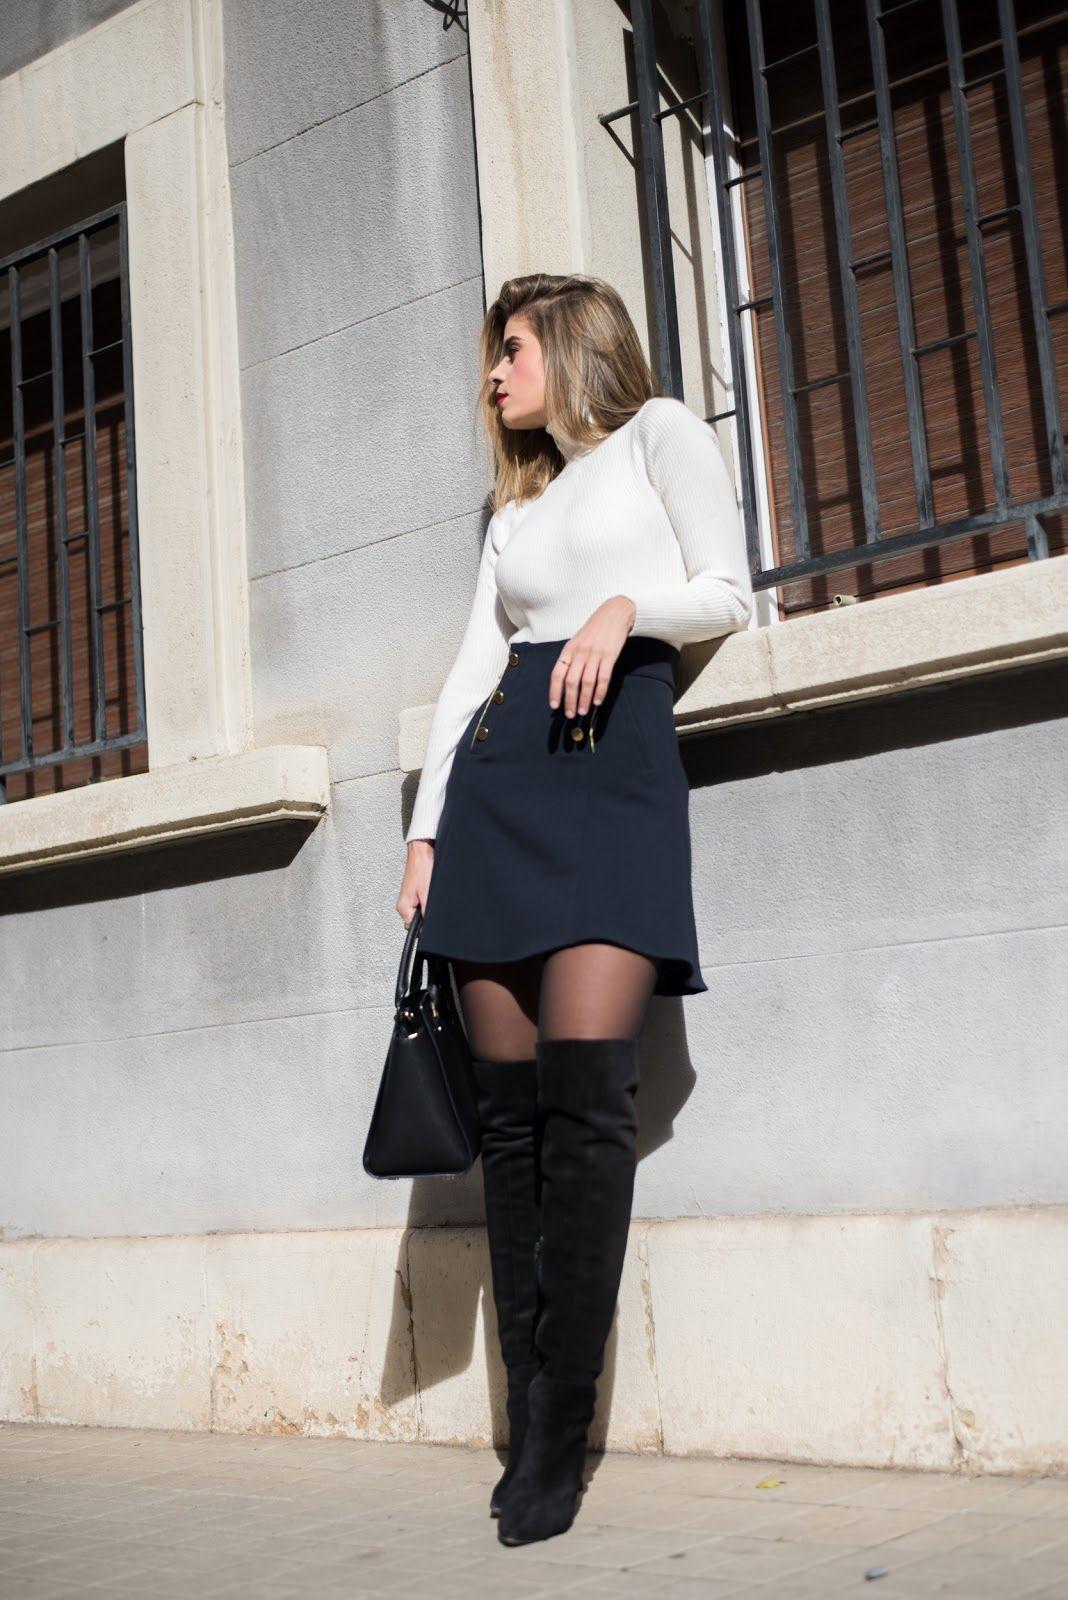 Pantyless Photo of Cara Delevingne. 2018-2019 celebrityes photos leaks! nude (98 photo), Instagram Celebrity images